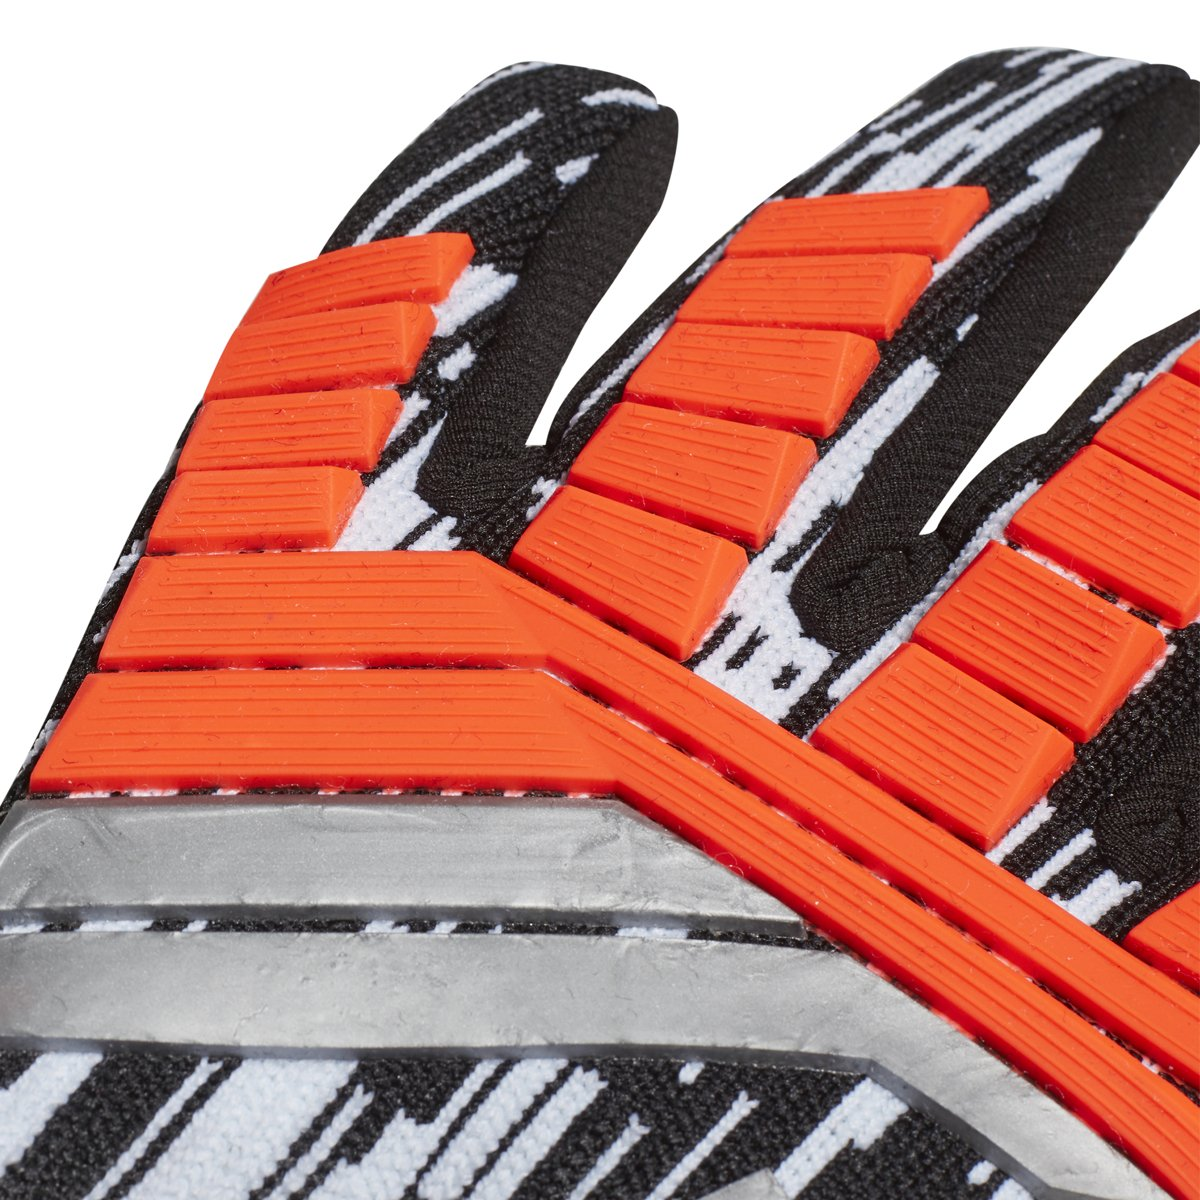 Adidas Guantes De Portero Depredador Amazon Pkws6ESV0O